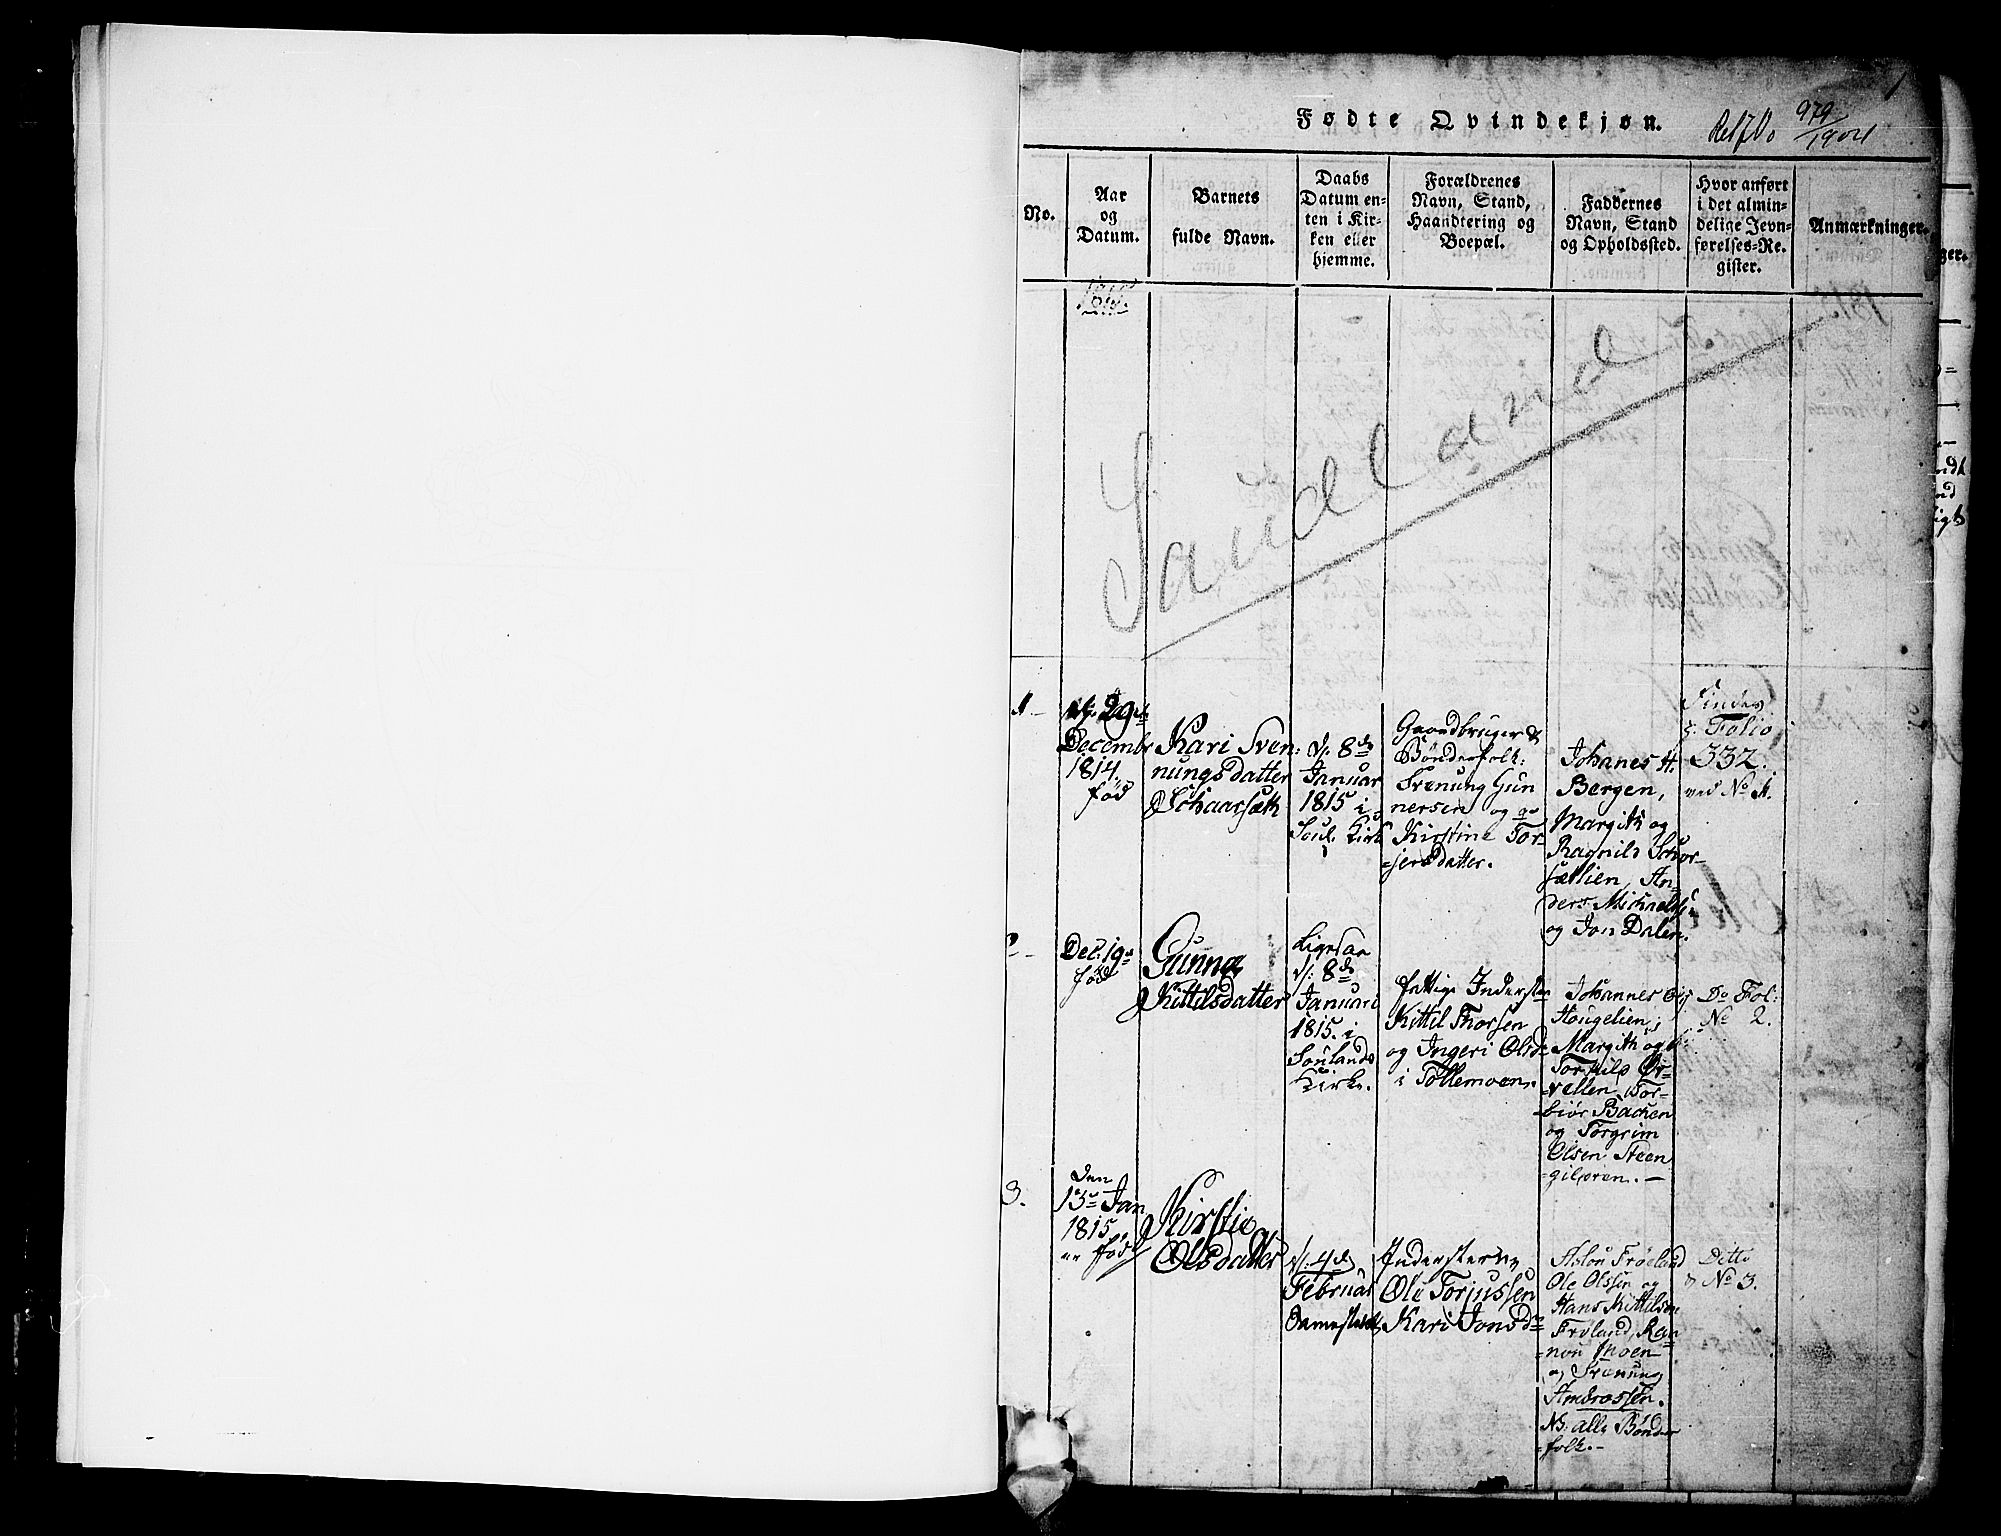 SAKO, Hjartdal kirkebøker, G/Gb/L0001: Klokkerbok nr. II 1, 1815-1842, s. 1